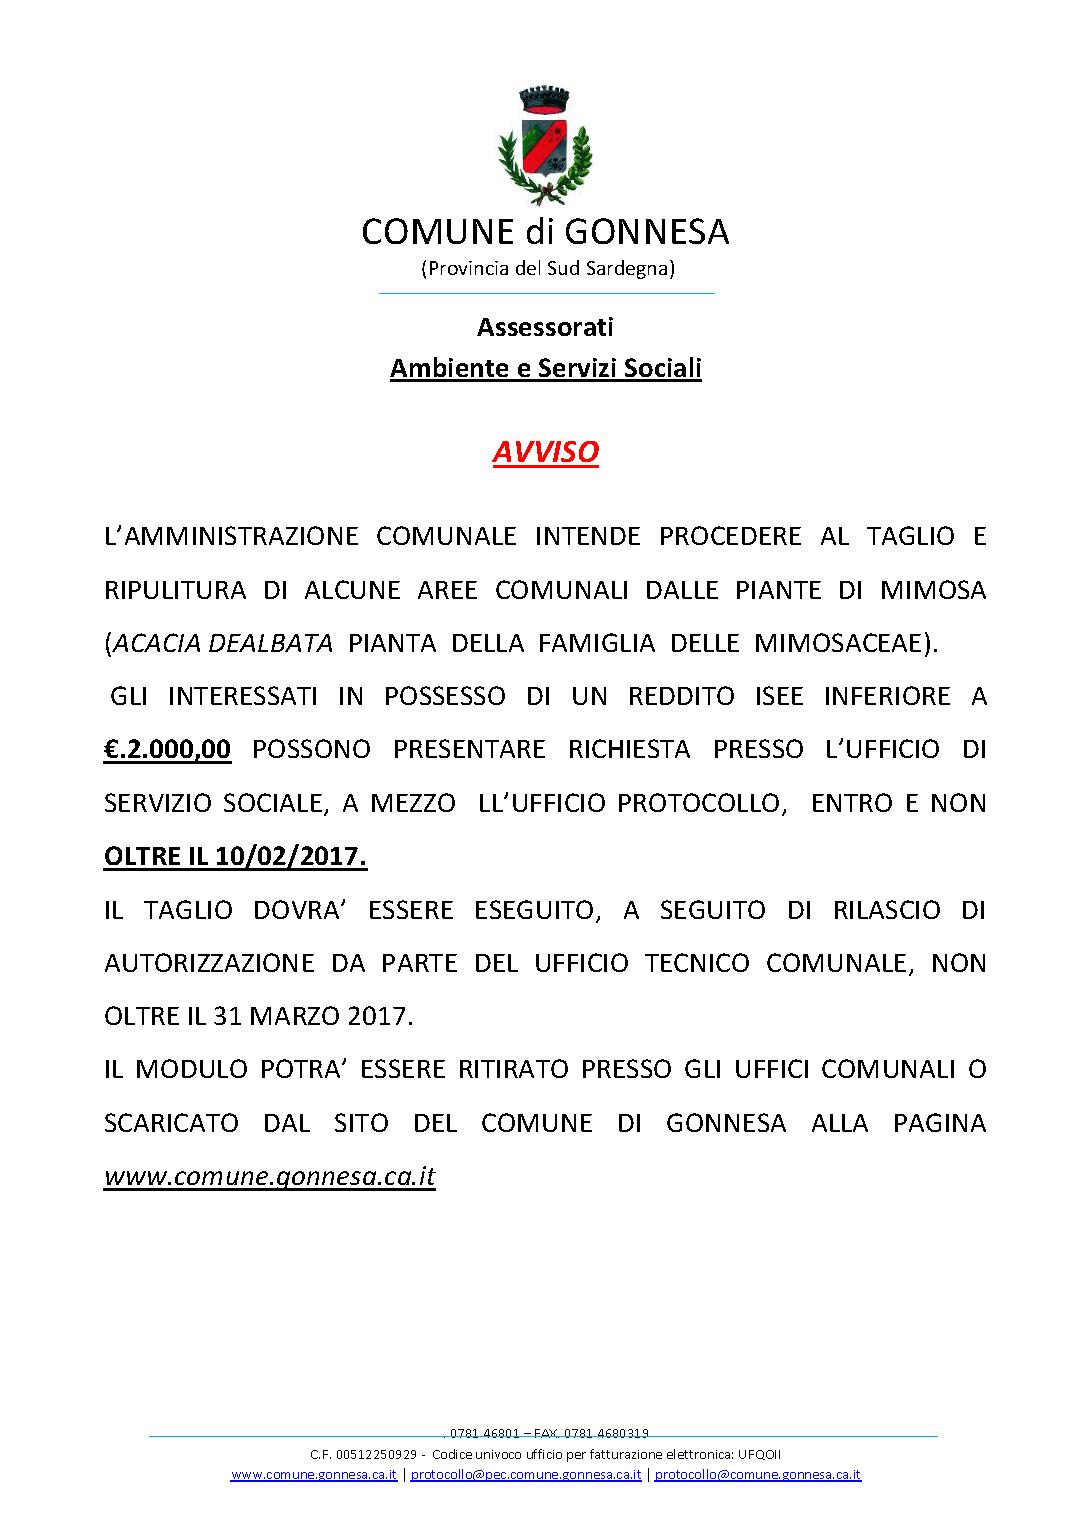 AVVISO TAGLIO MIMOSE